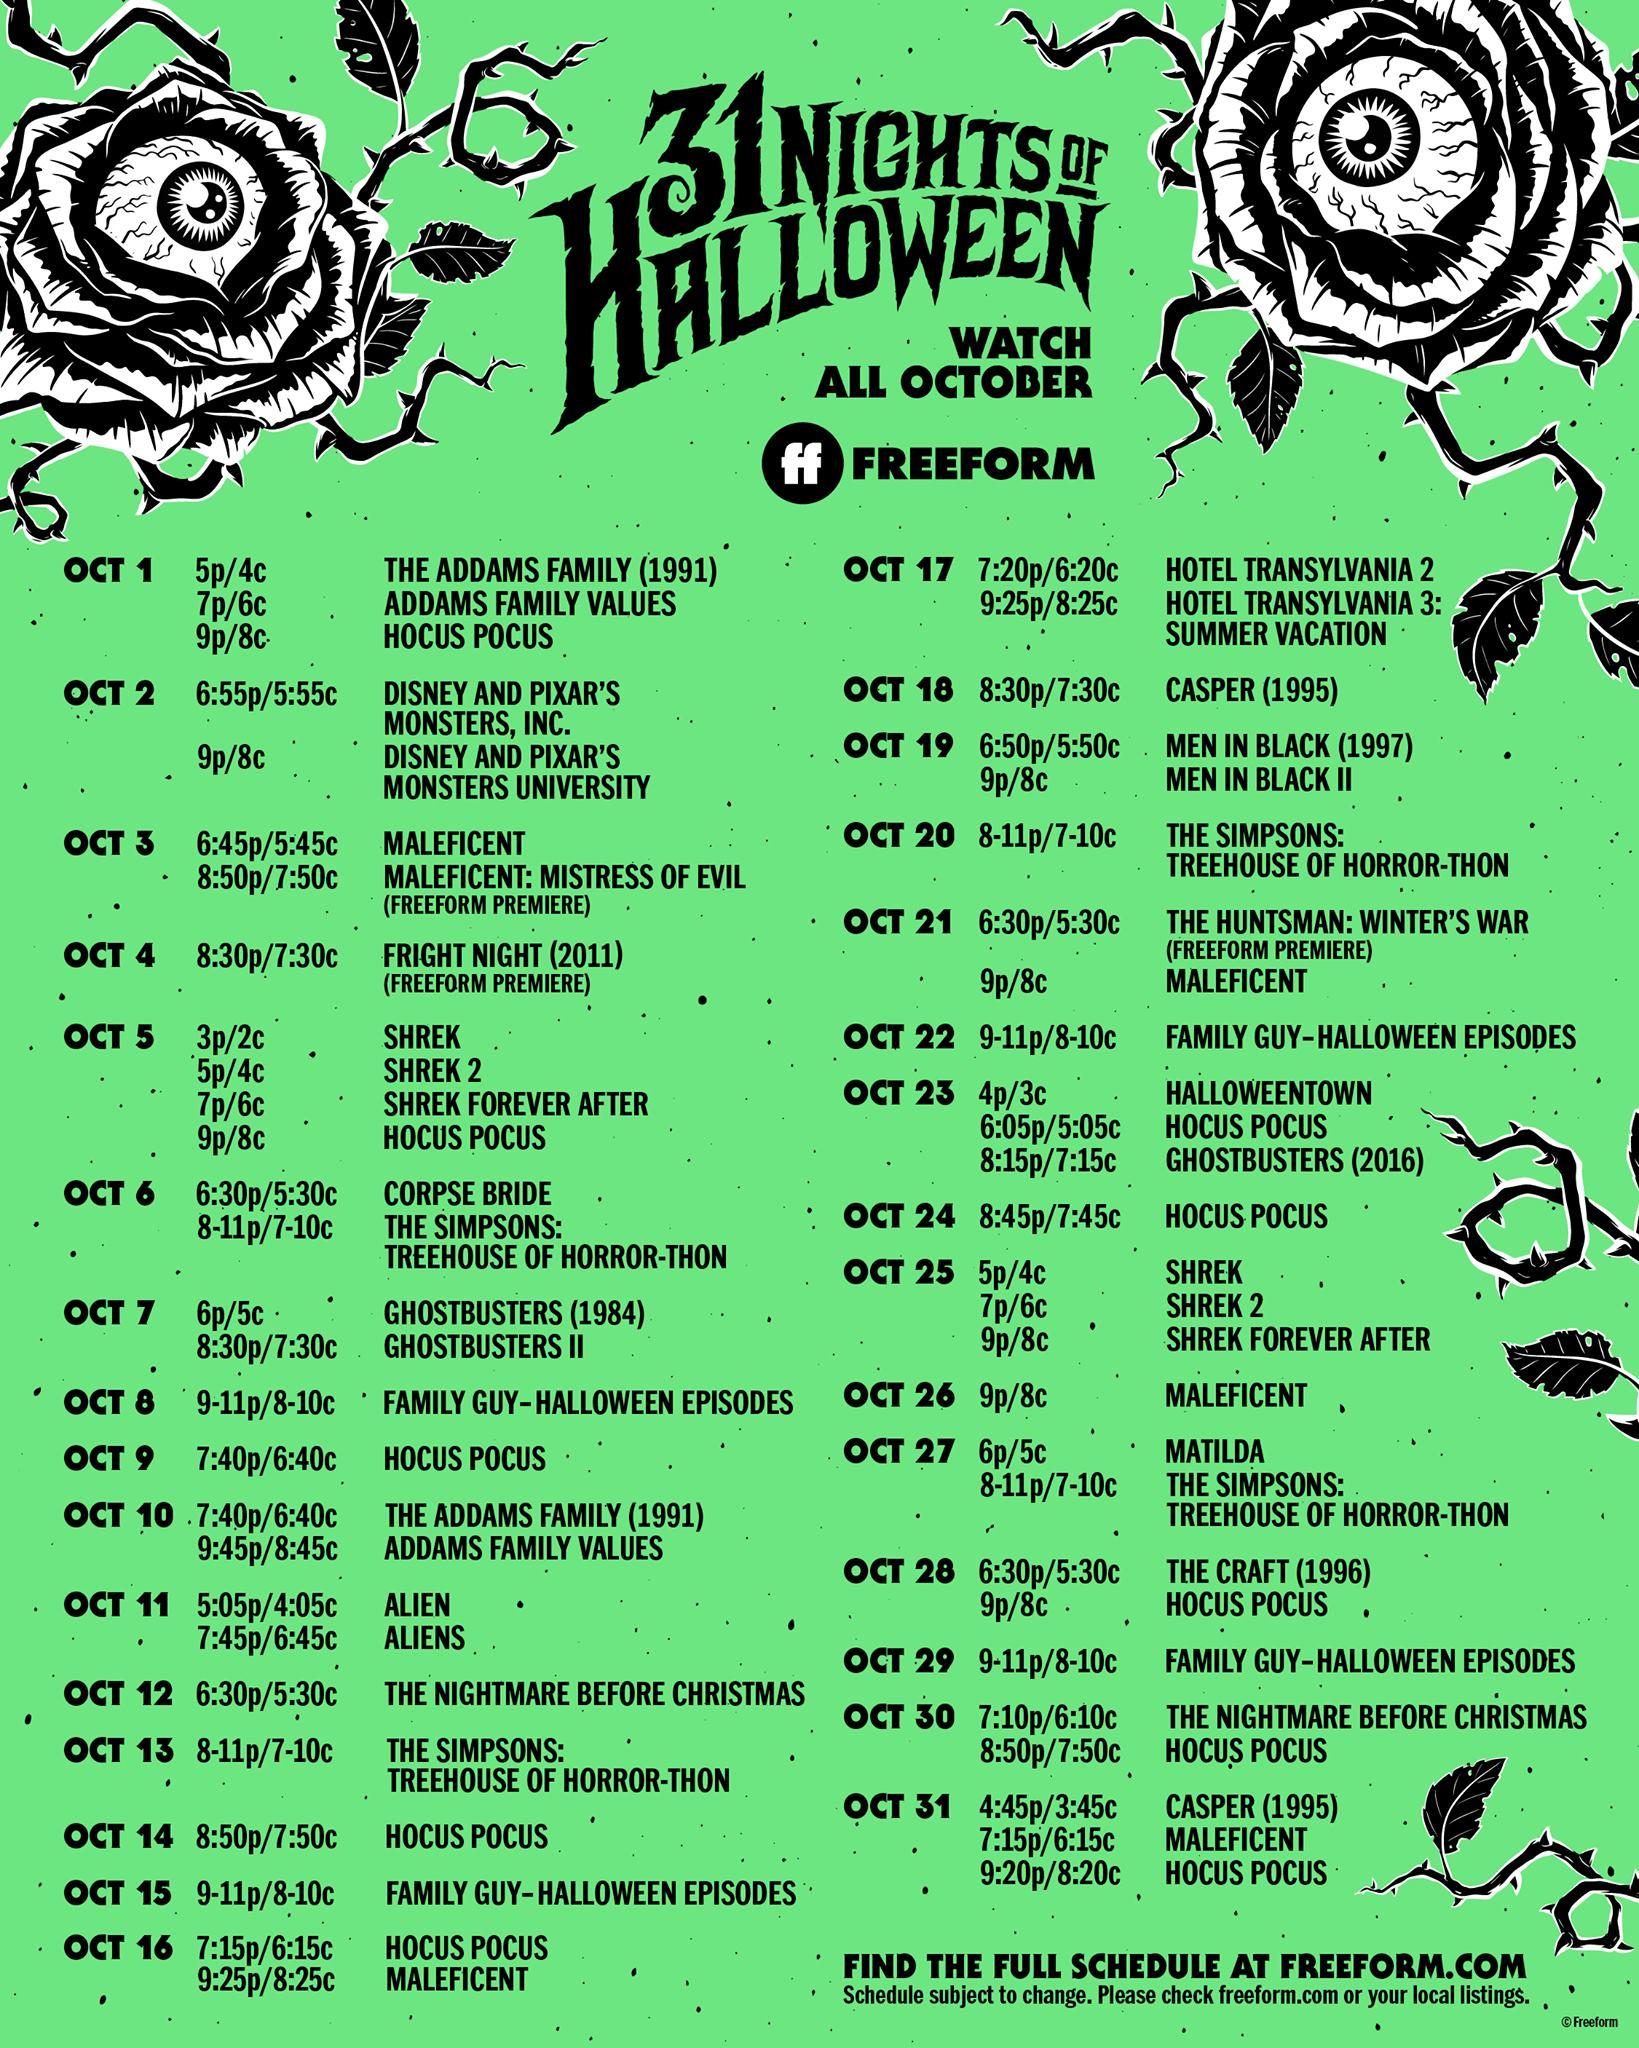 Freeform 31 Nights of Halloween 2021 Schedule